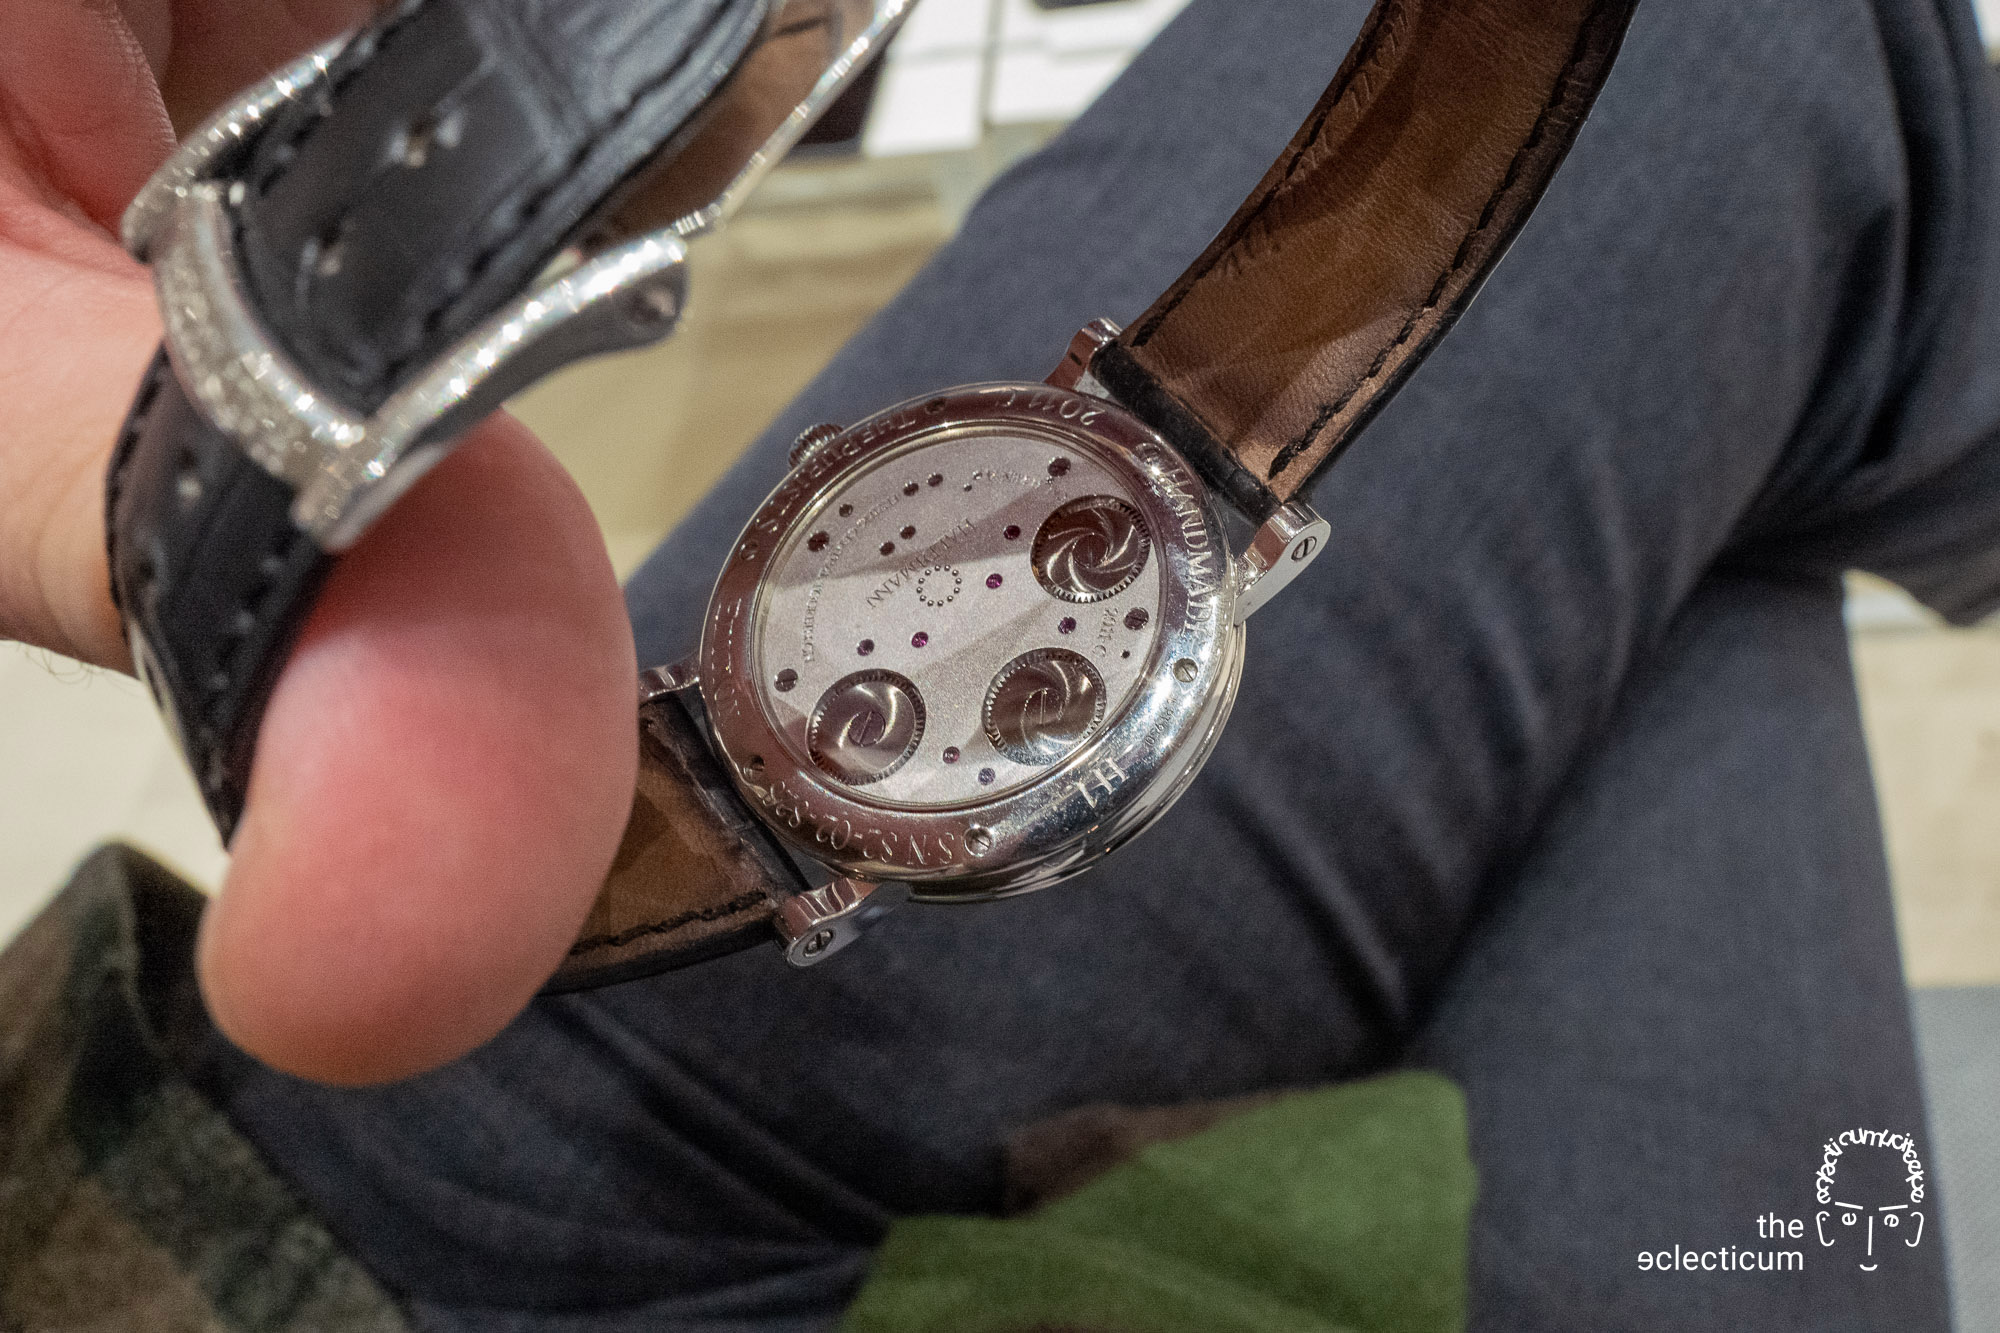 Haldimann H1 Flying central tourbillon ahci independent watchmaking